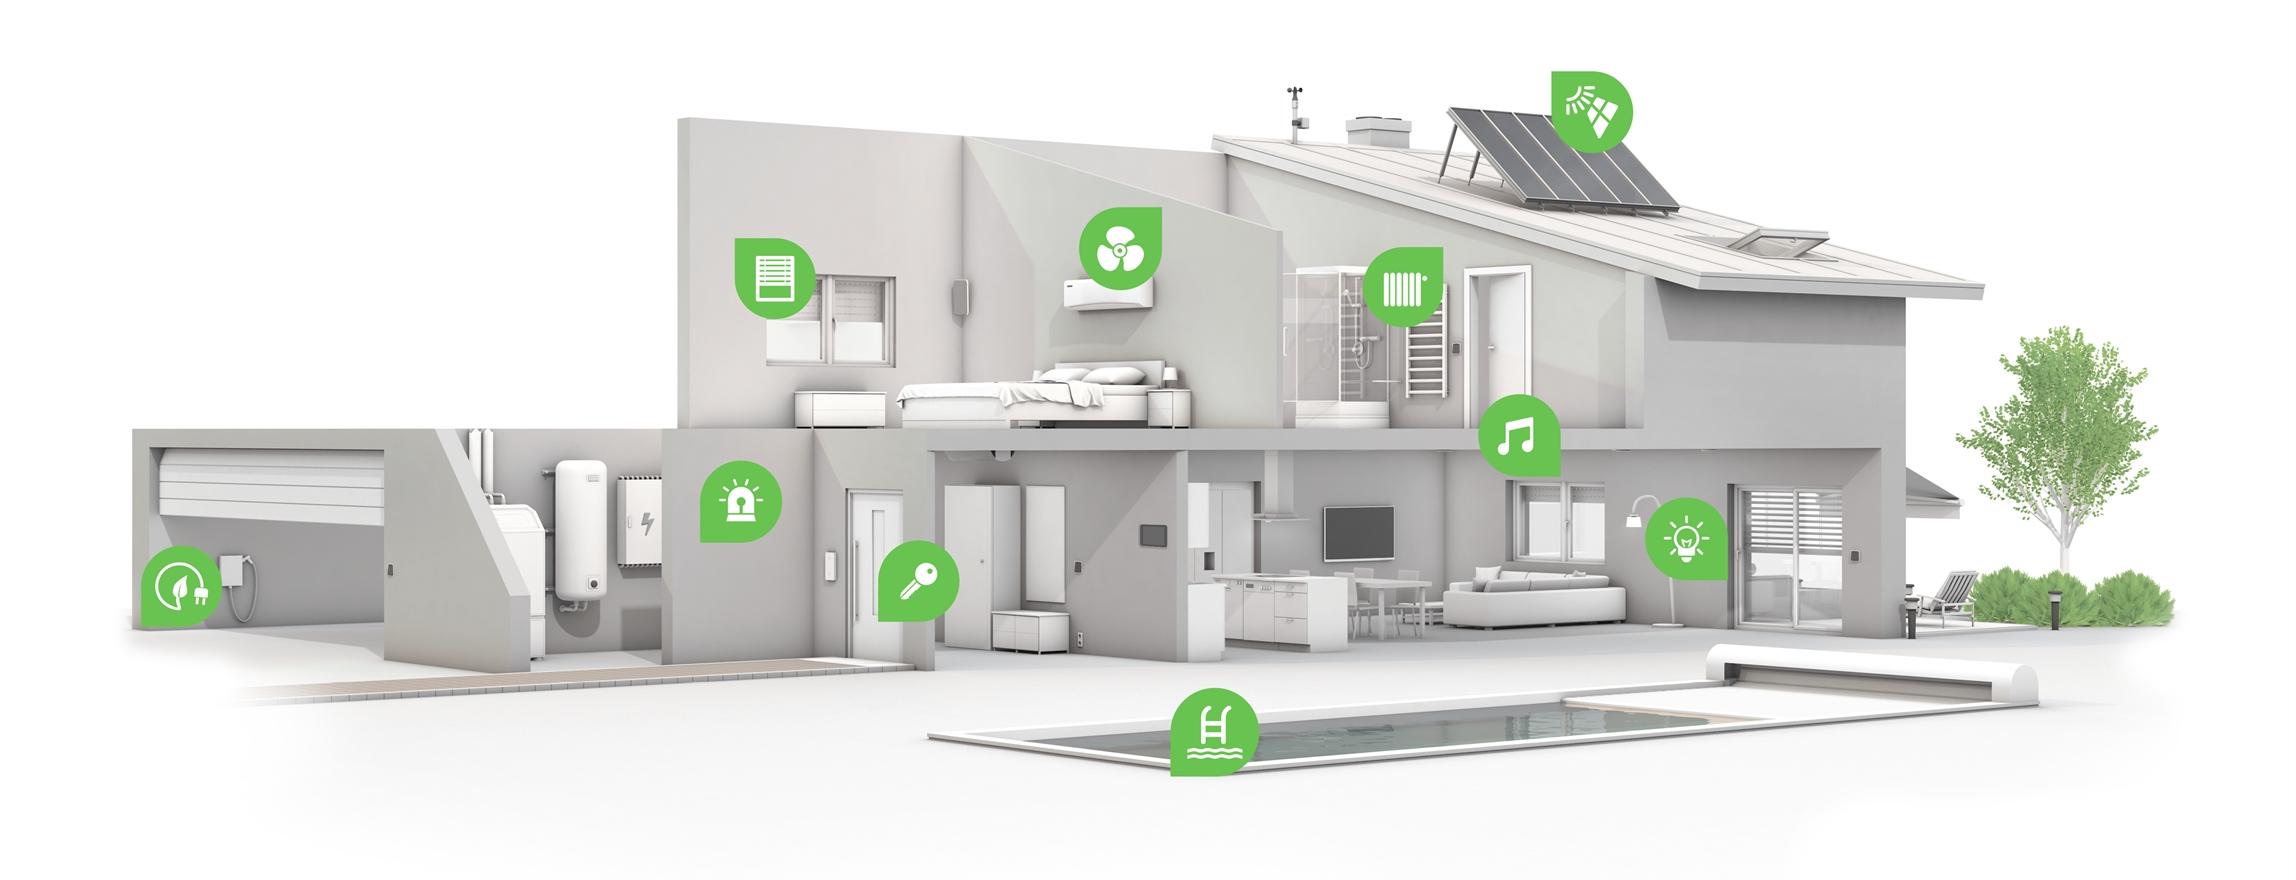 IG_3d-house-everything-managed.jpg